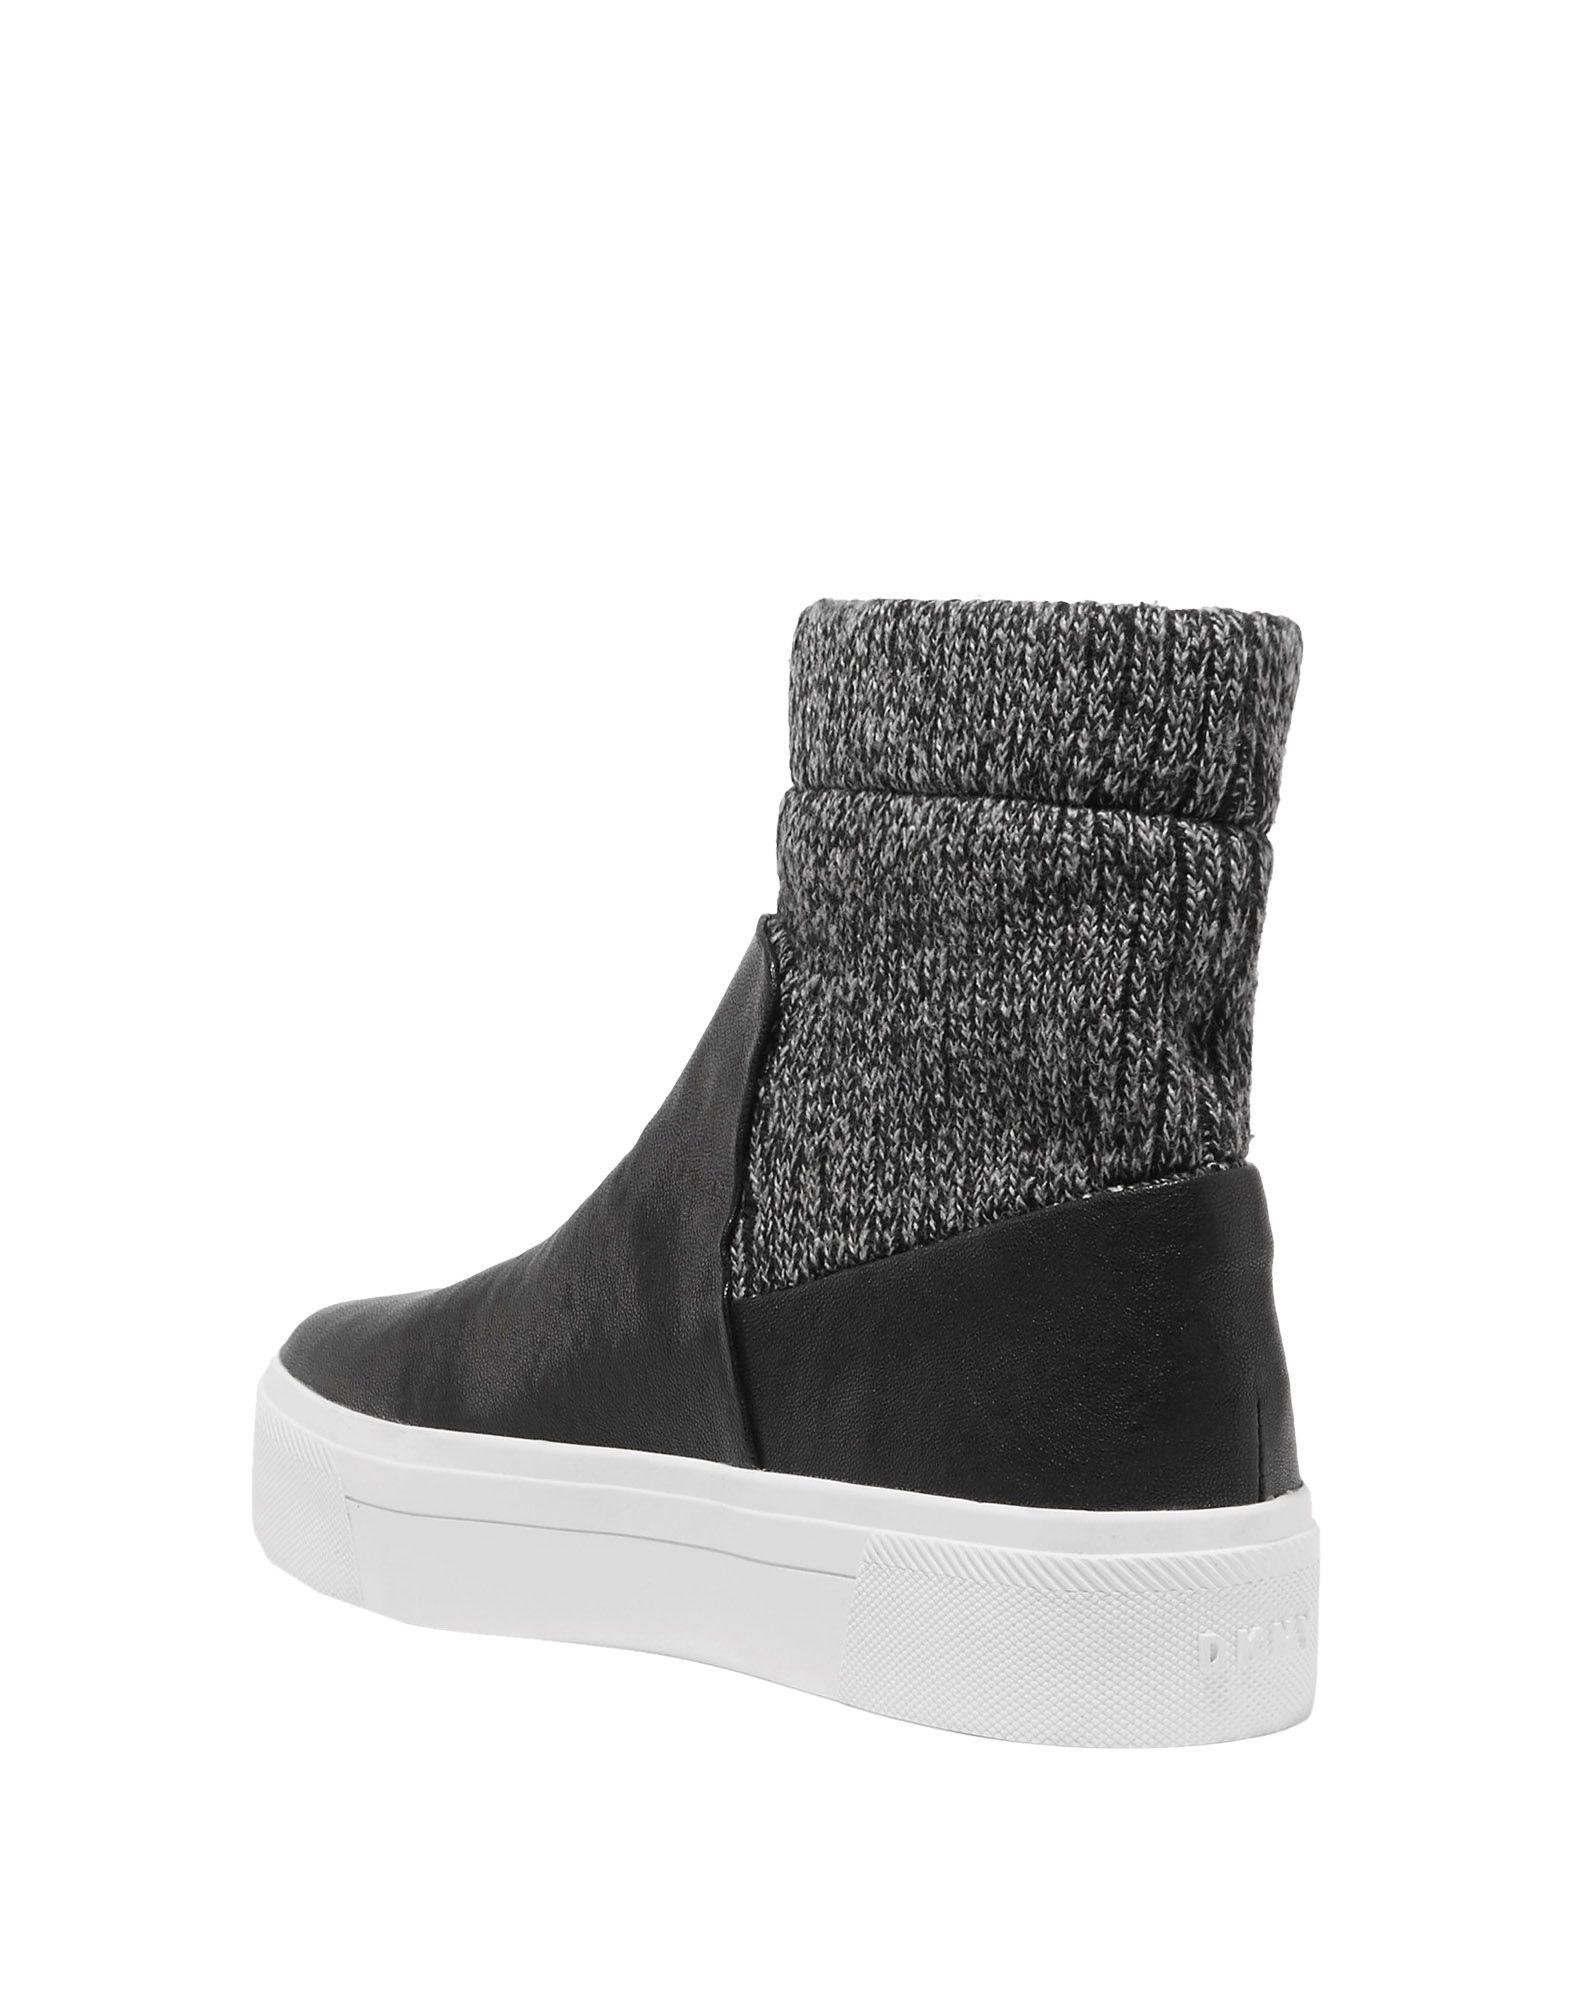 ... Stilvolle Damen billige Schuhe Dkny Stiefelette Damen Stilvolle  11524206UA 95e8ca ... ec740ef03e